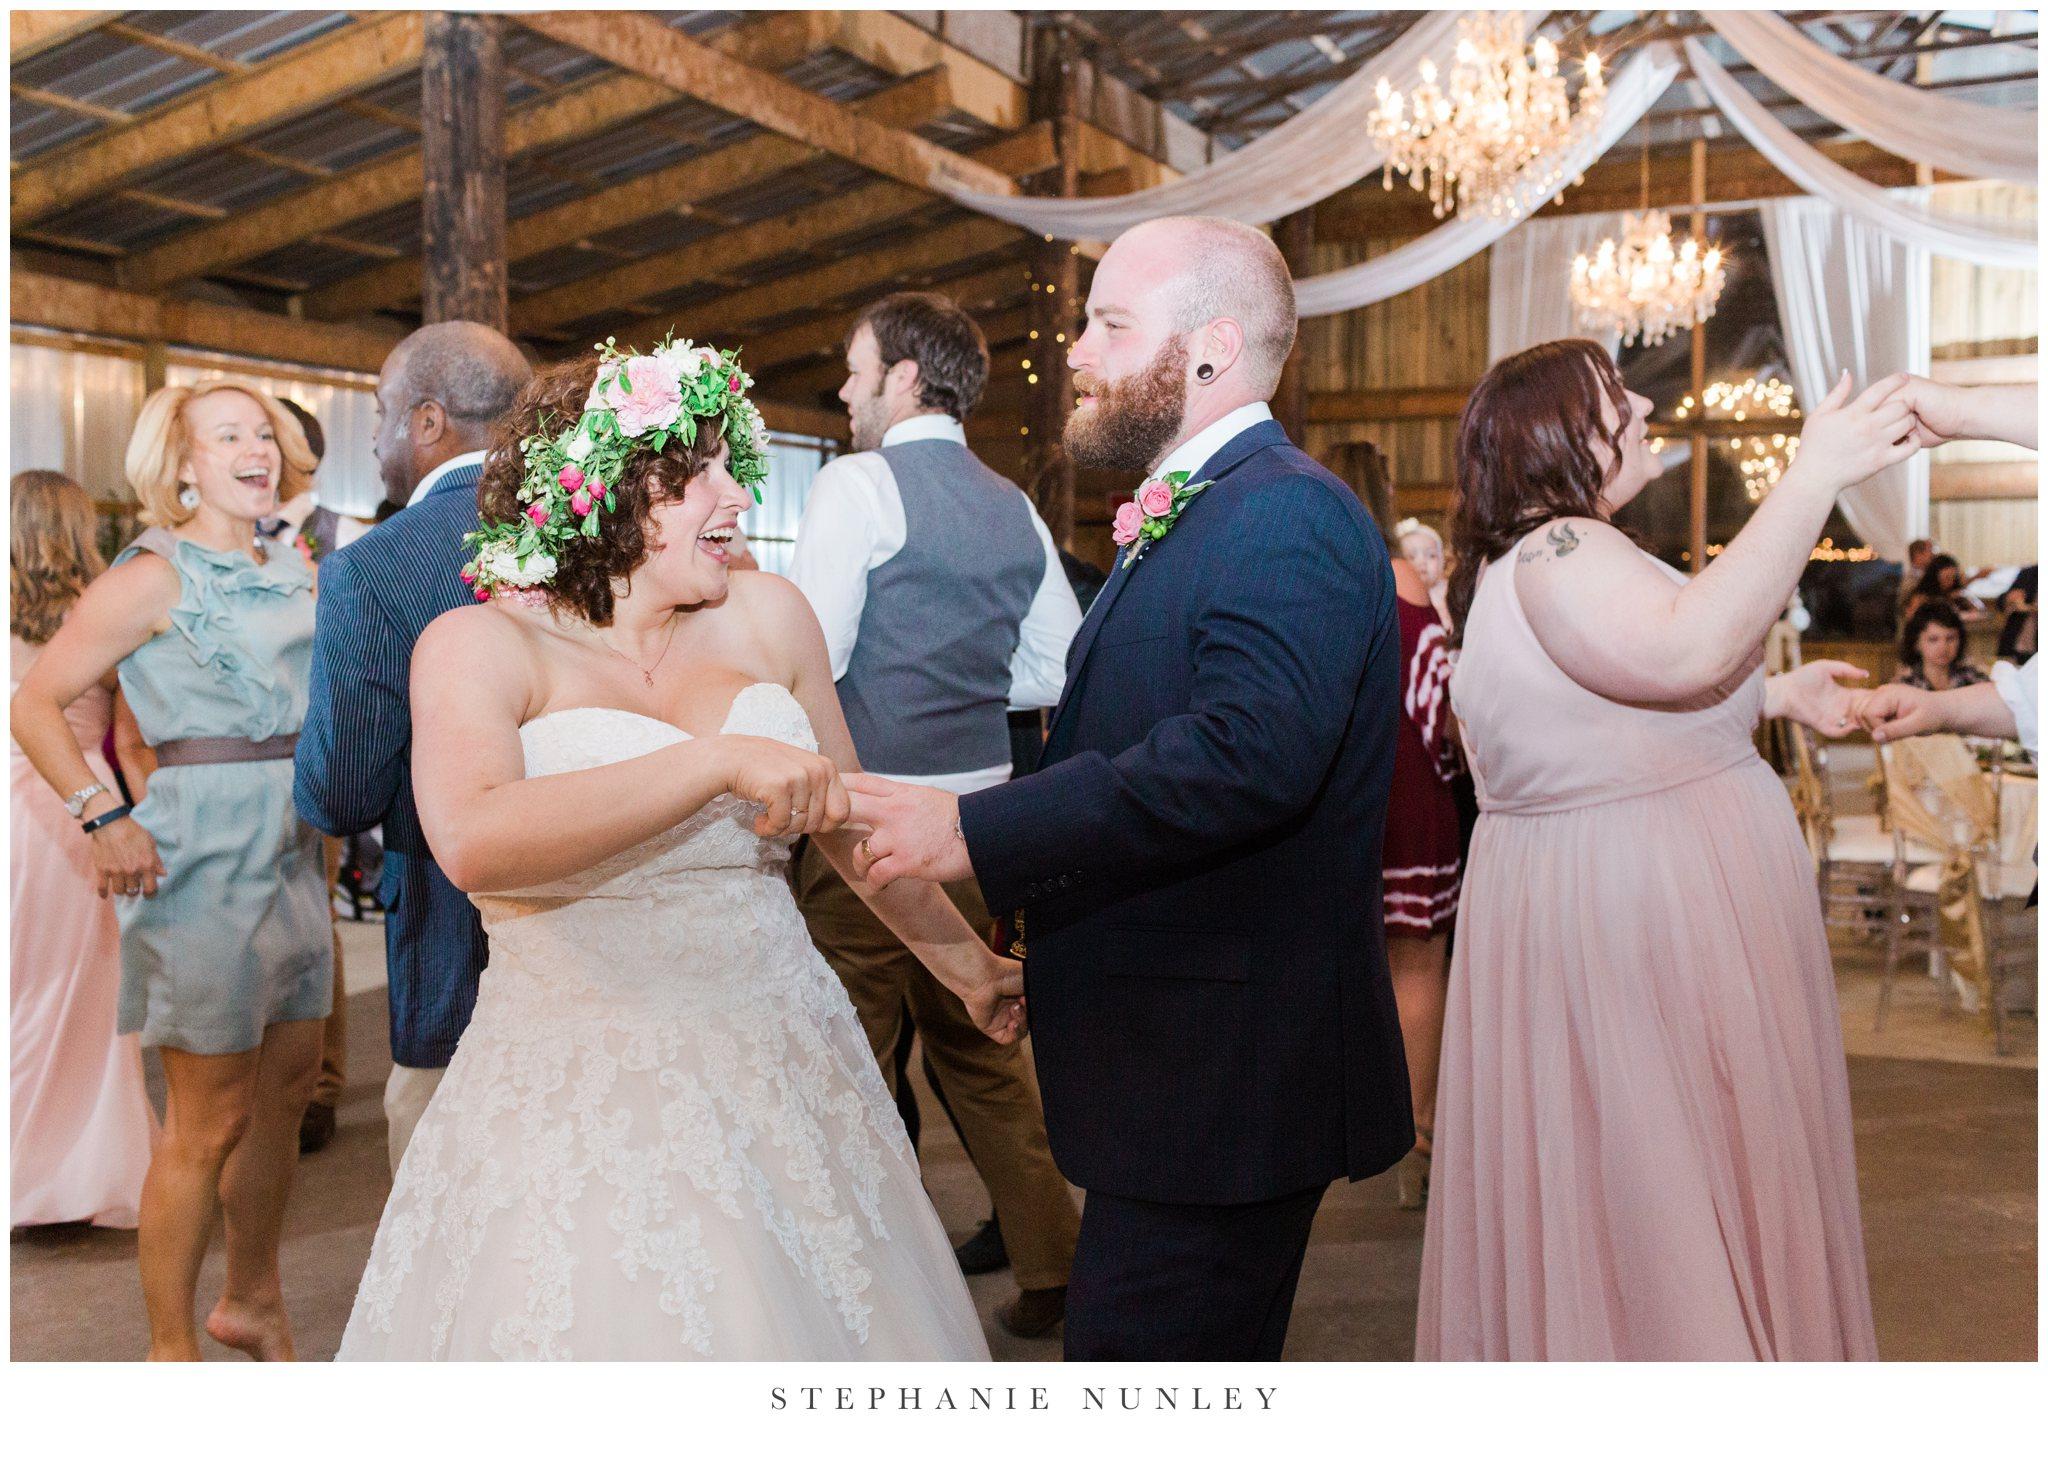 romantic-outdoor-wedding-with-flower-crown-0146.jpg